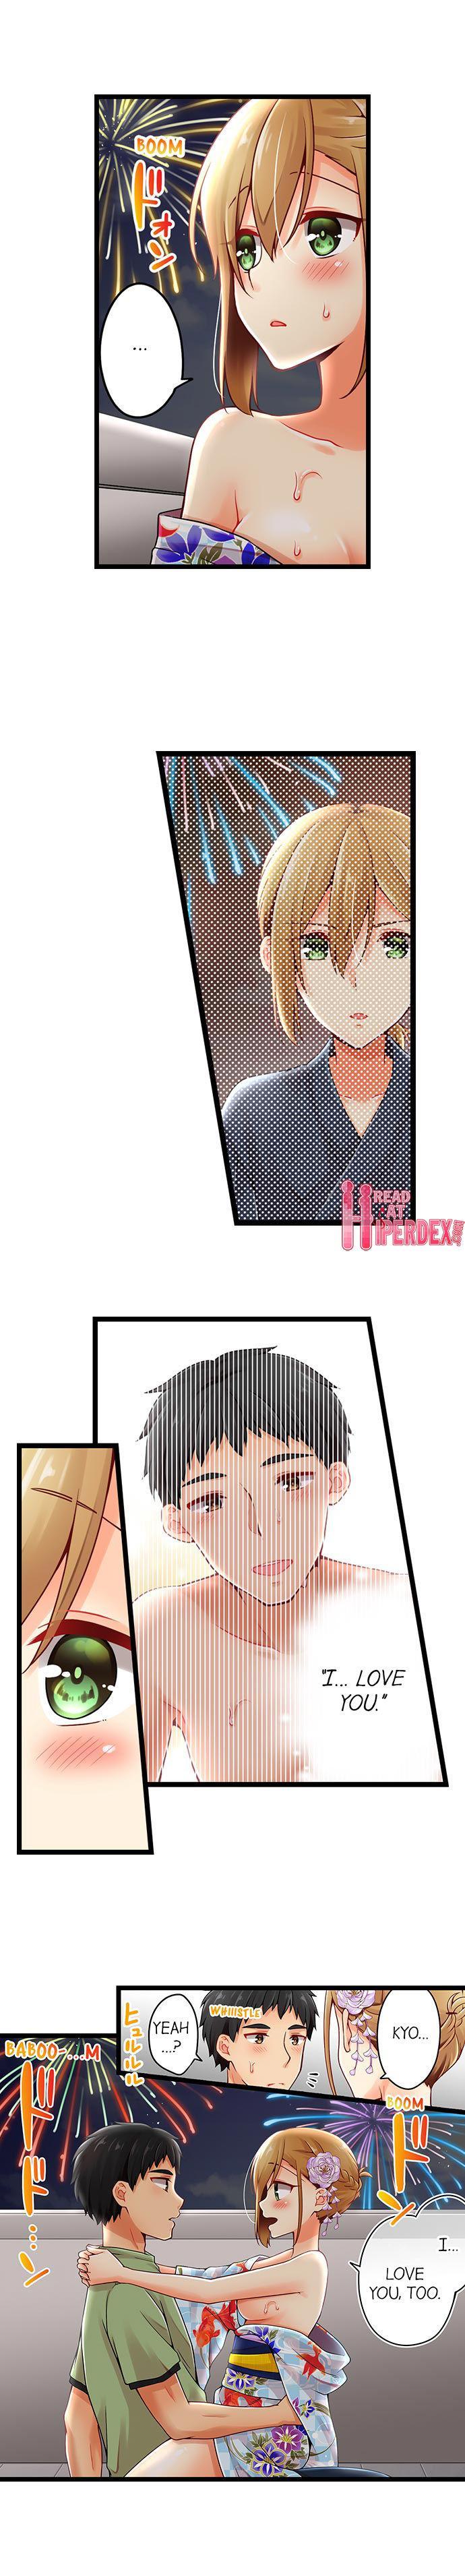 Ren Arisugawa Is Actually A Girl 793